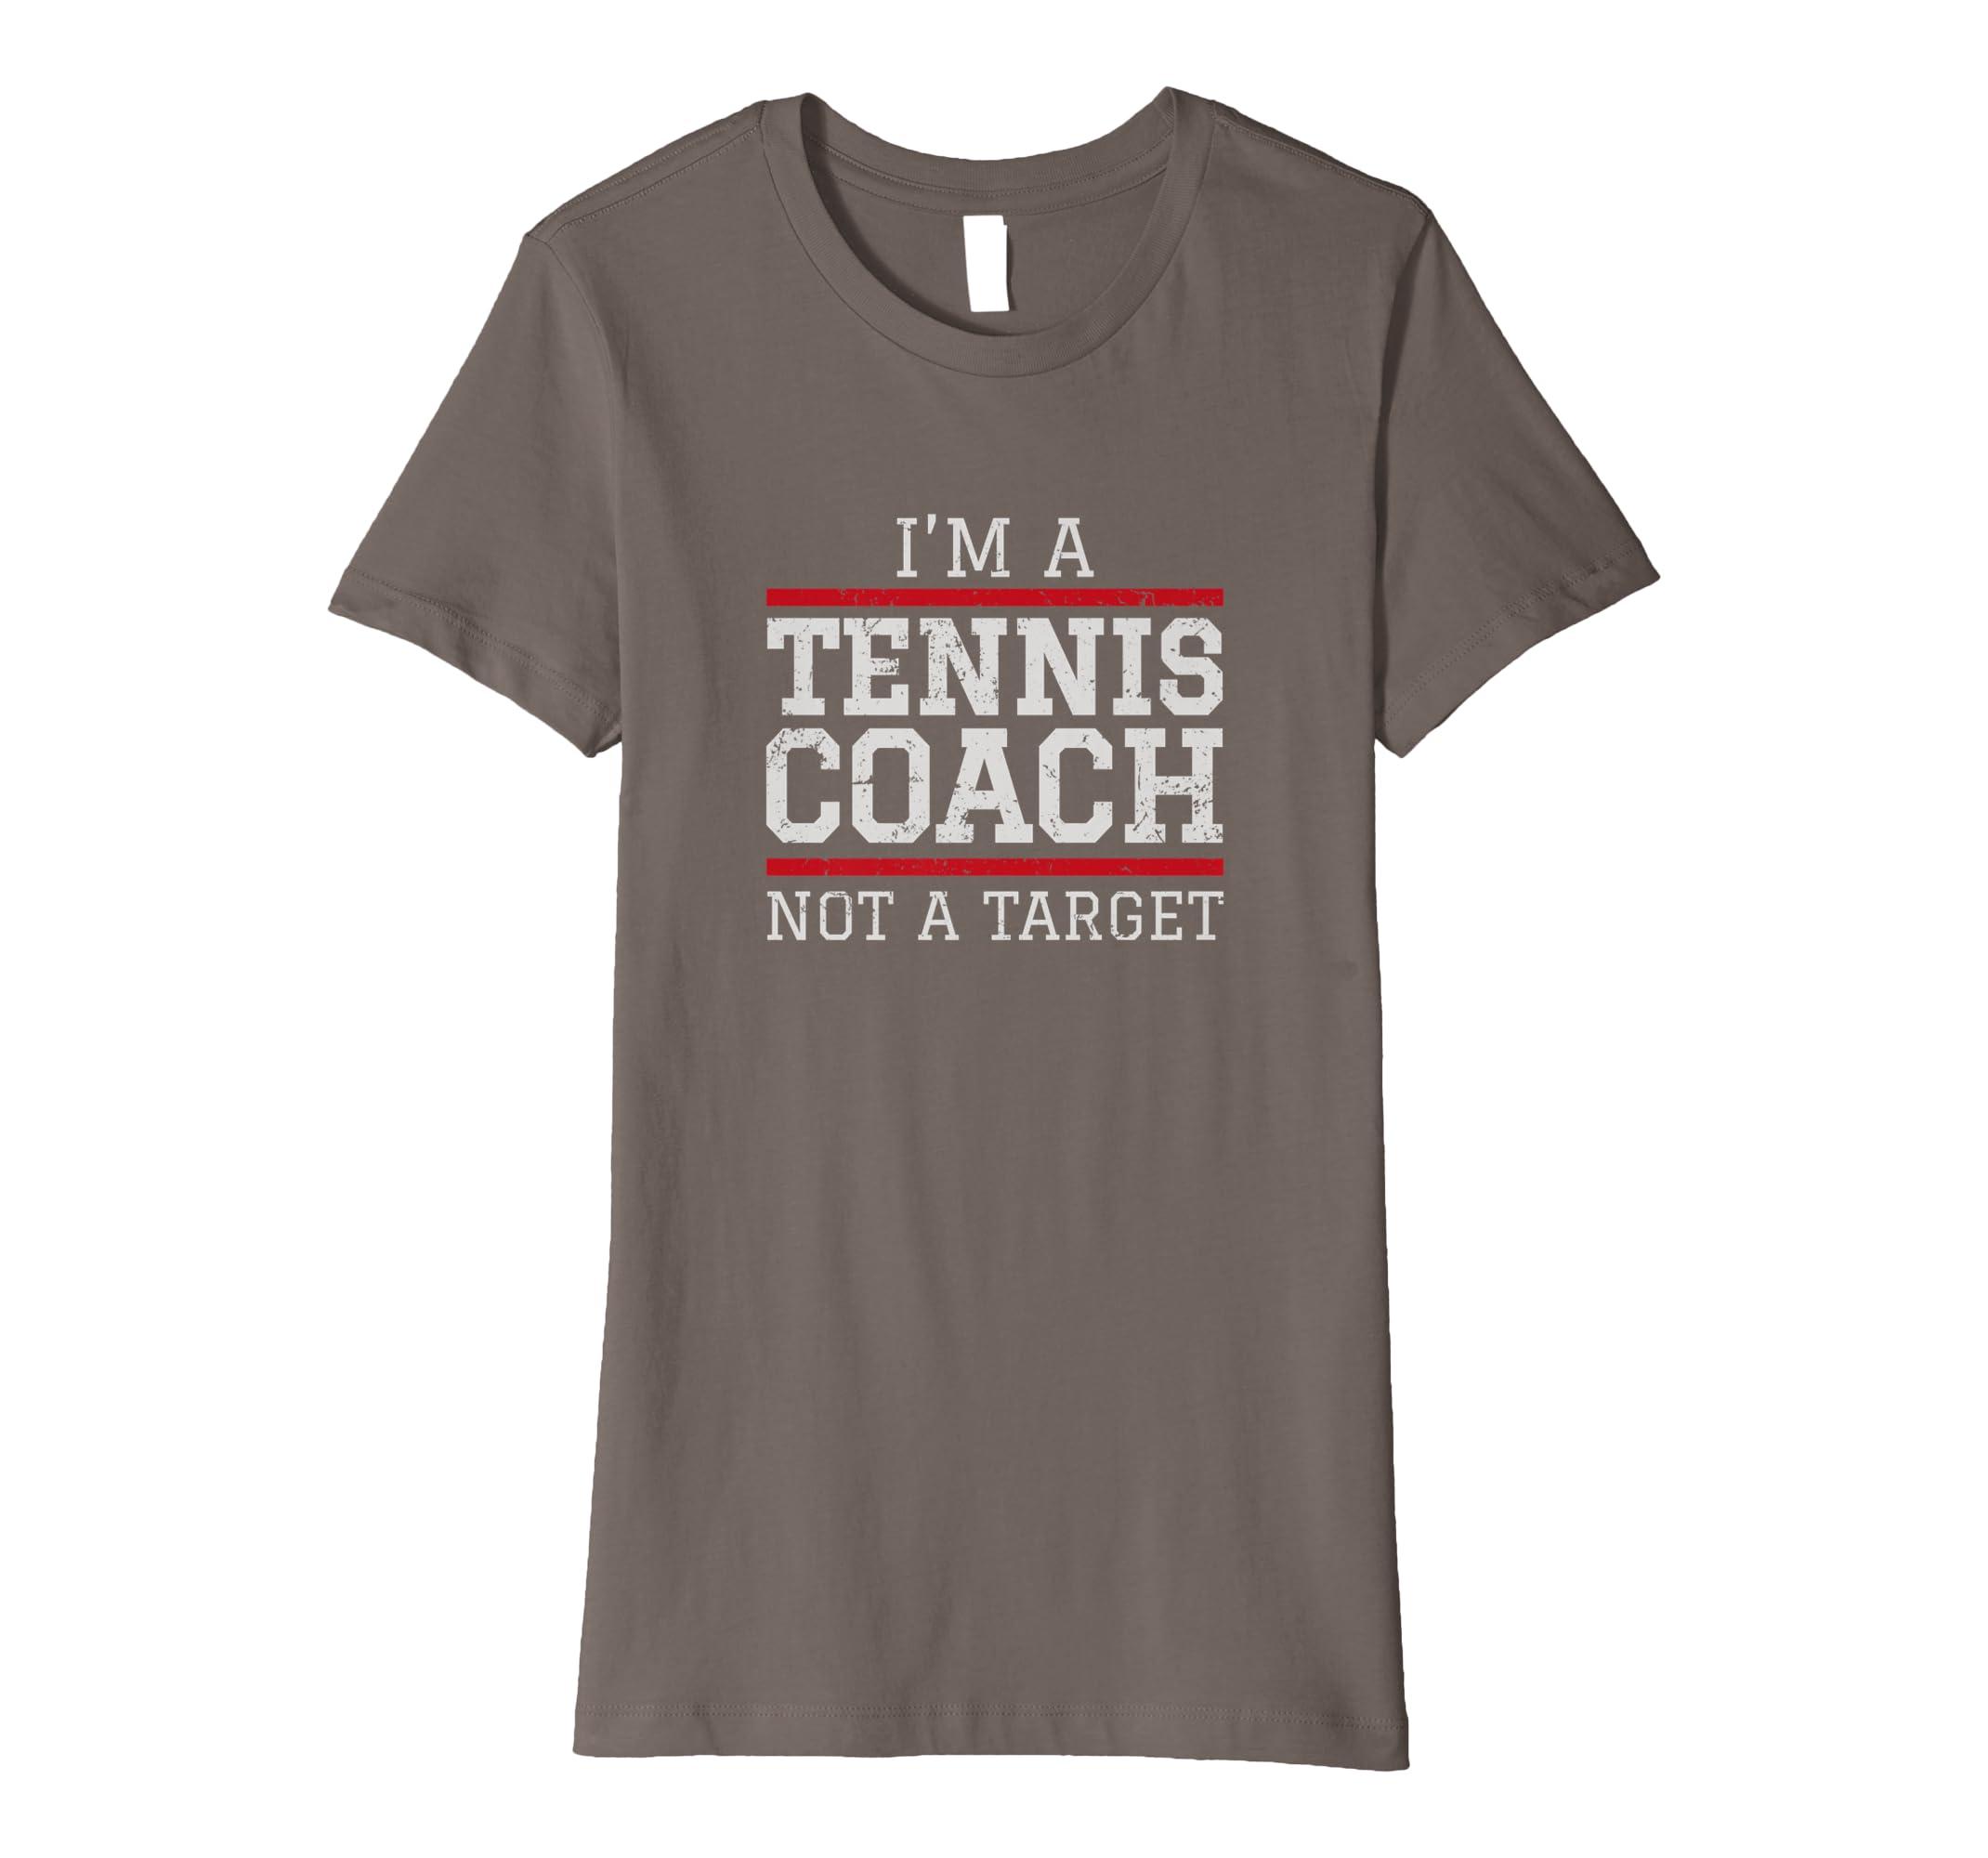 93cffc5f Amazon.com: Tennis Coach Tee Shirt - Not A Target: Clothing